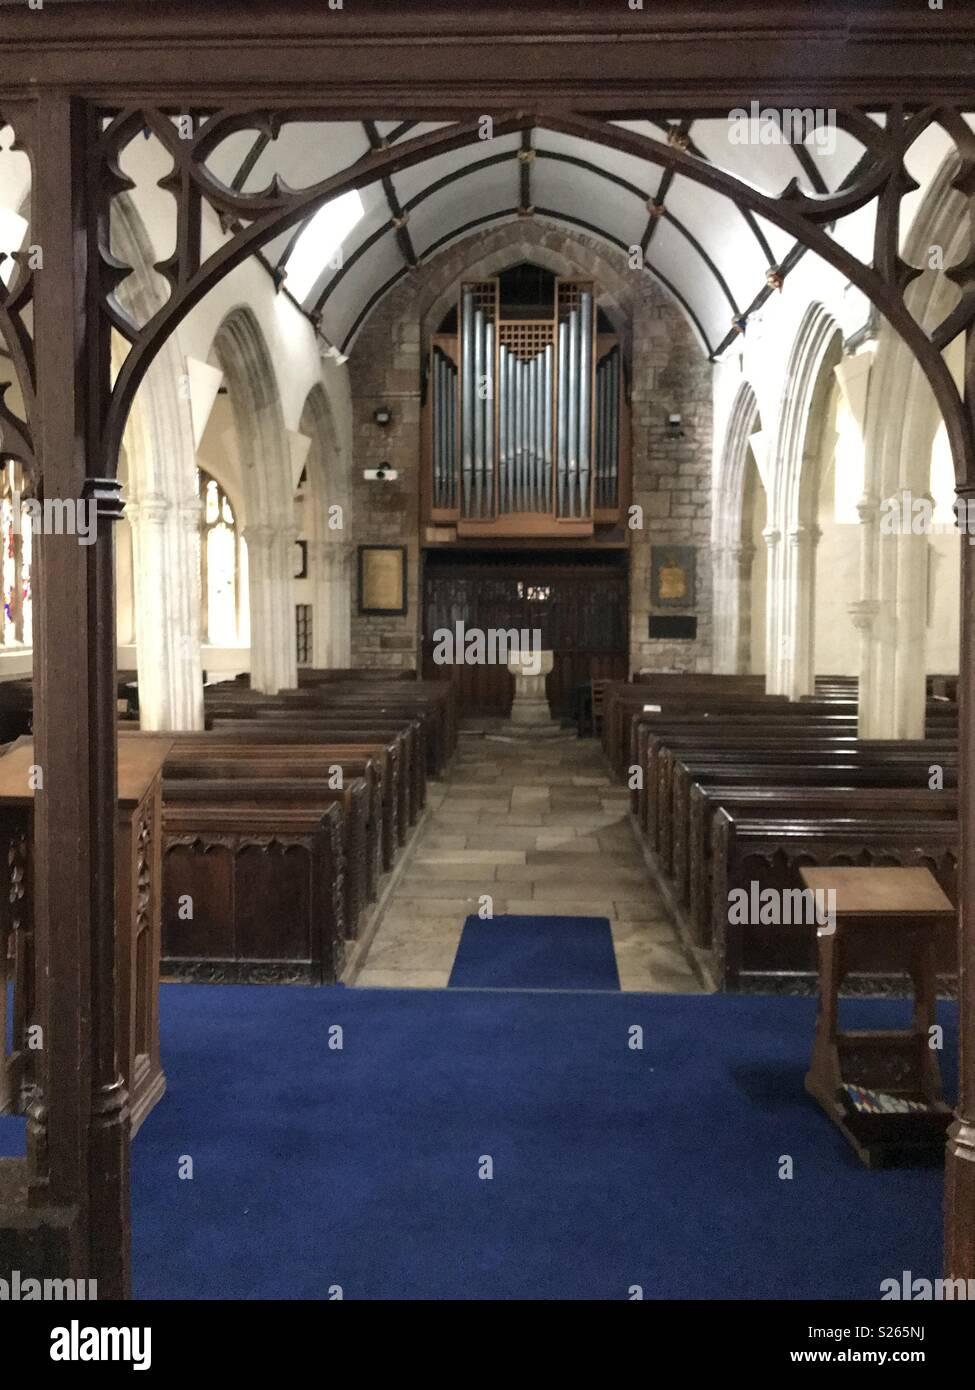 A Devon church of Distinction - Stock Image